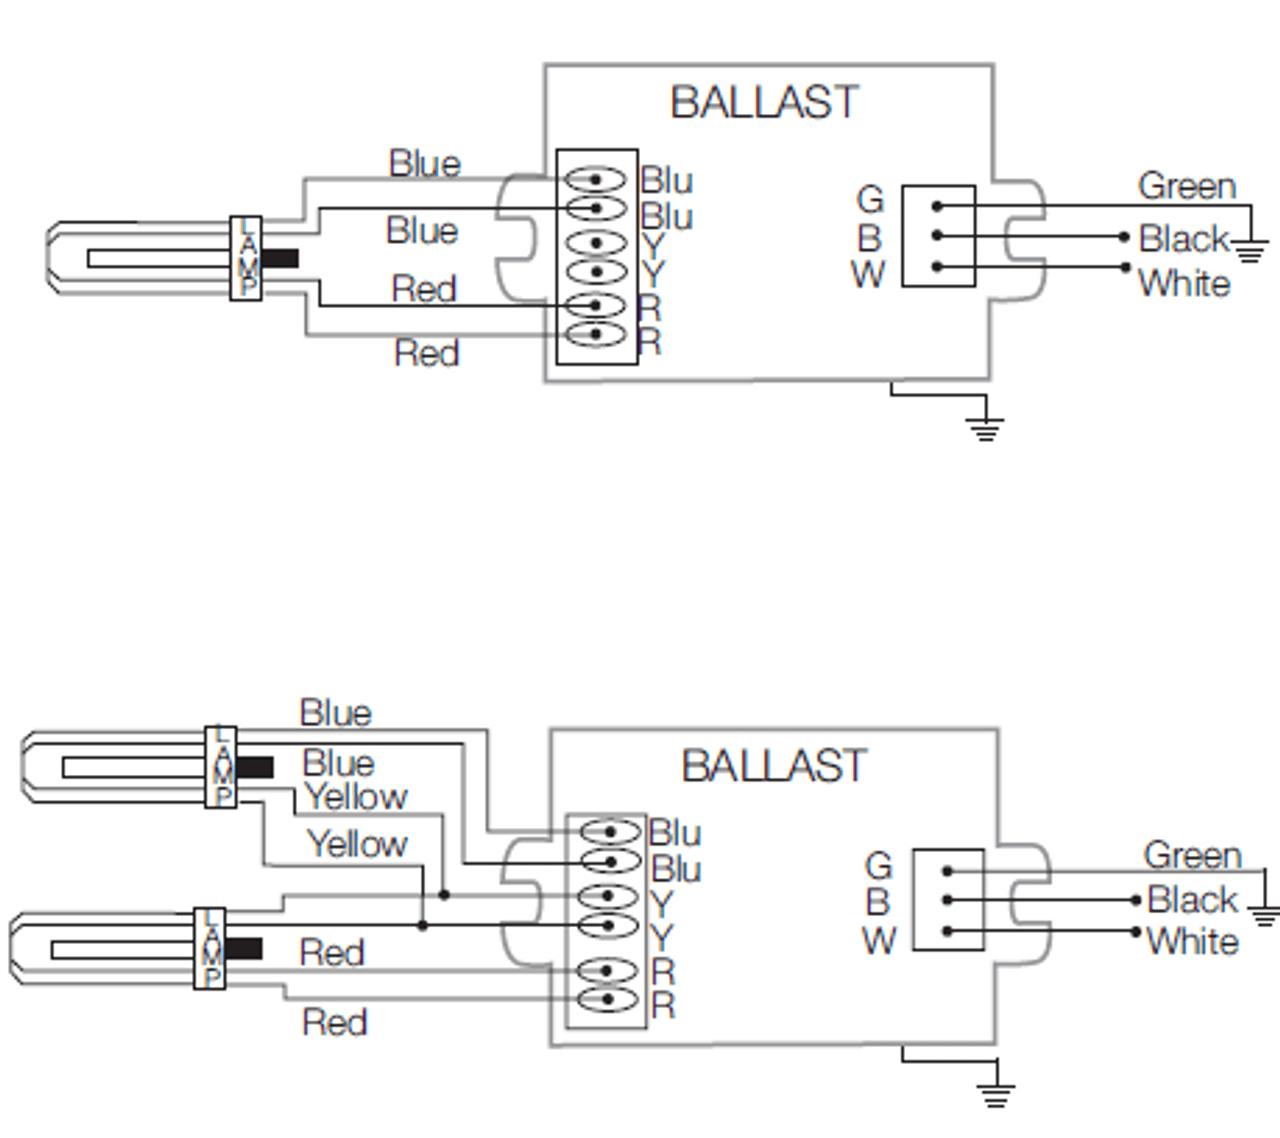 small resolution of sylvania ballast wiring diagram guide about wiring diagram osram sylvania ballast wiring diagram